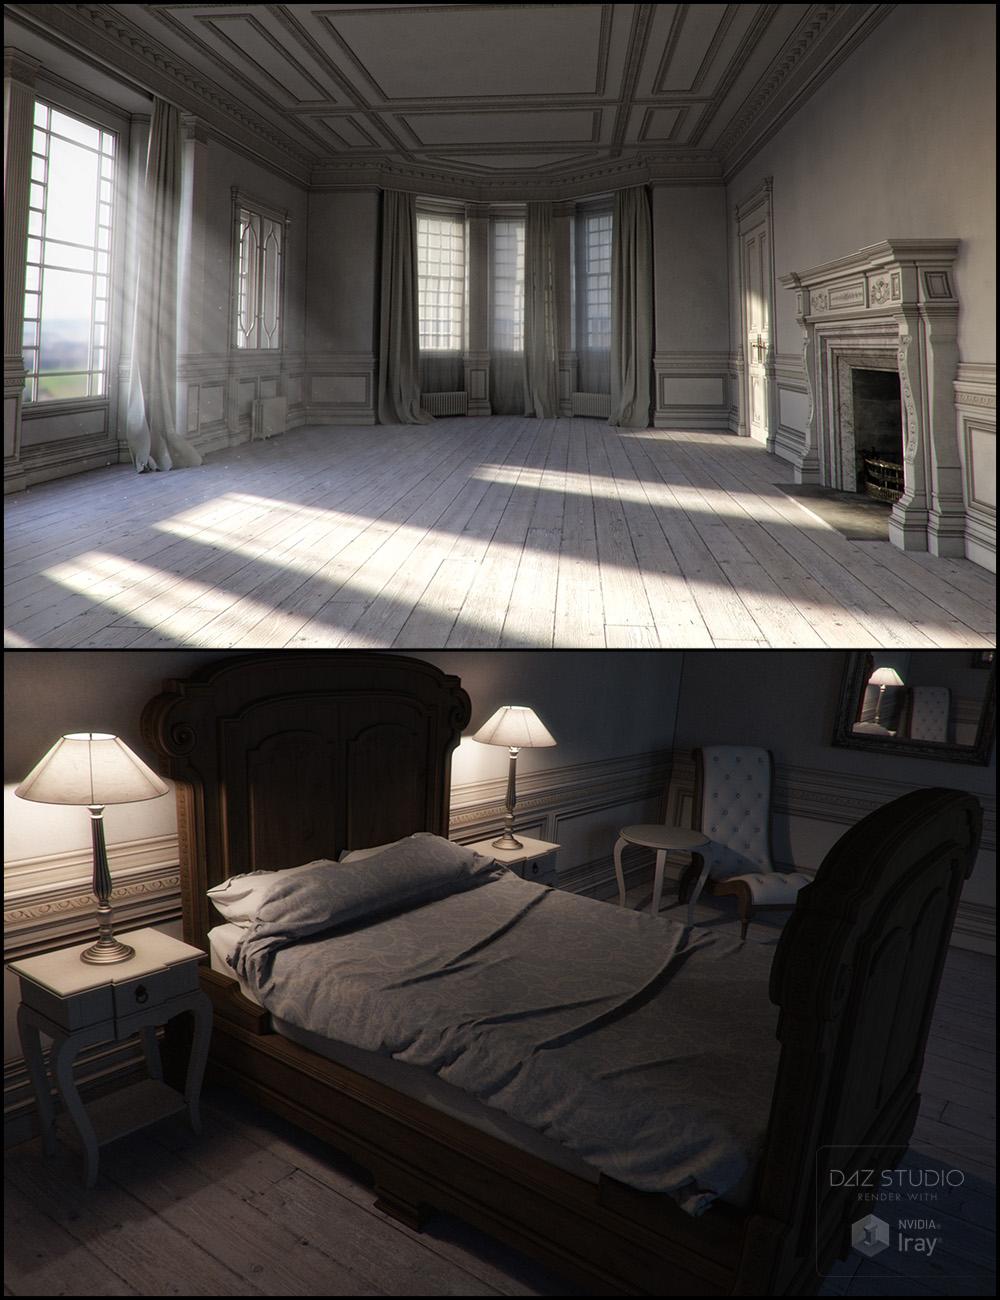 Rural Chateau Bundle Iray Addon by: Jack Tomalin, 3D Models by Daz 3D